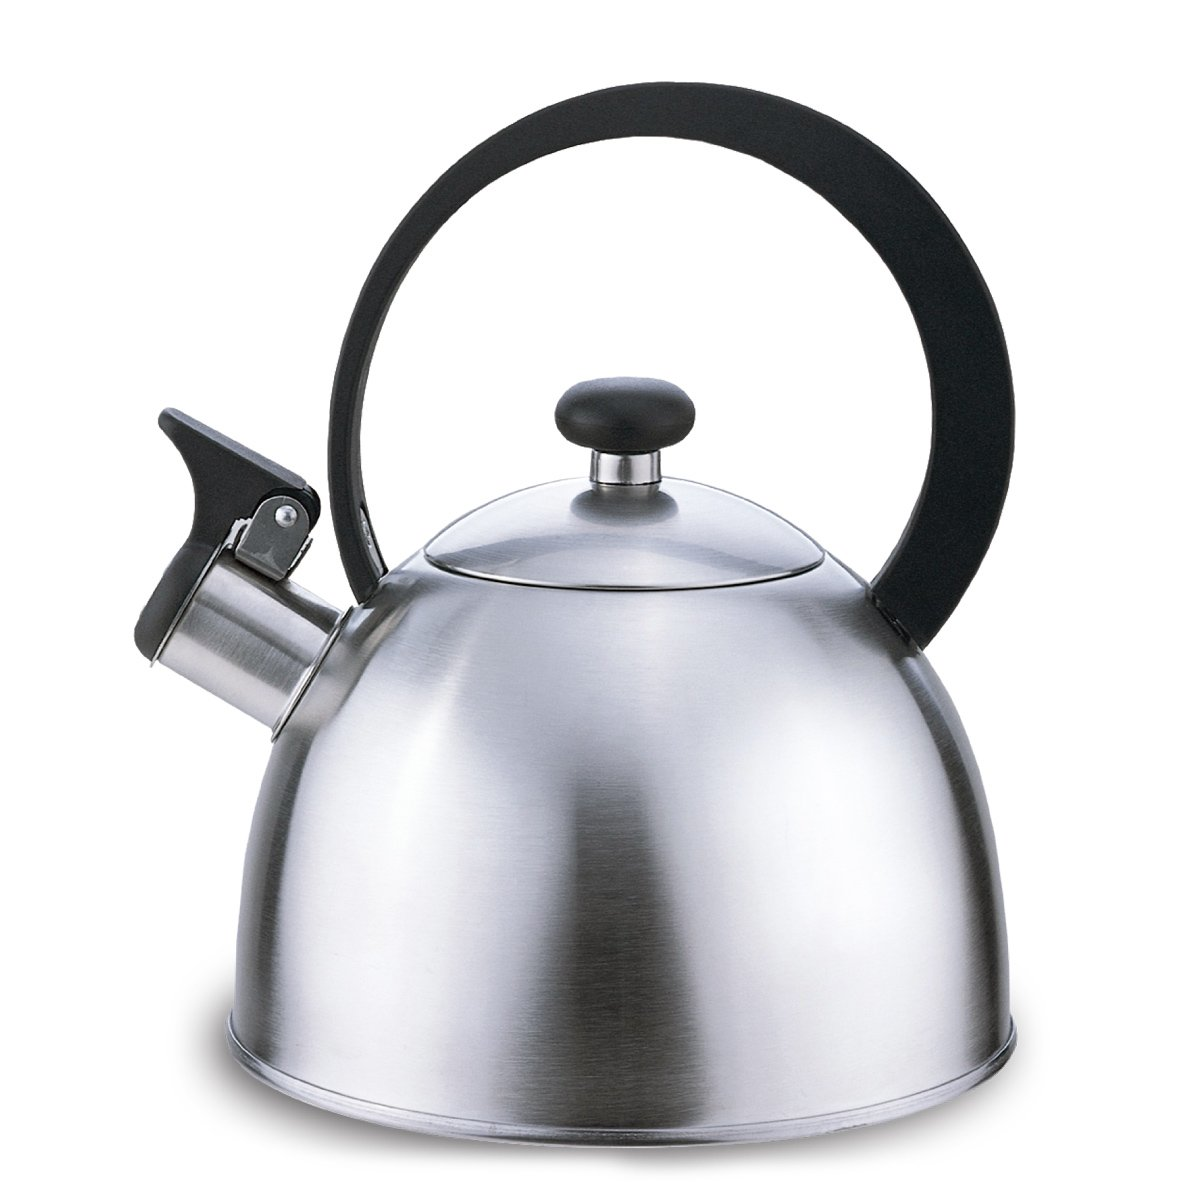 Riwendell Stainless Steel Whistling Tea Kettle 2.7-Quart Stove Top Kettle Teapot (Silver)